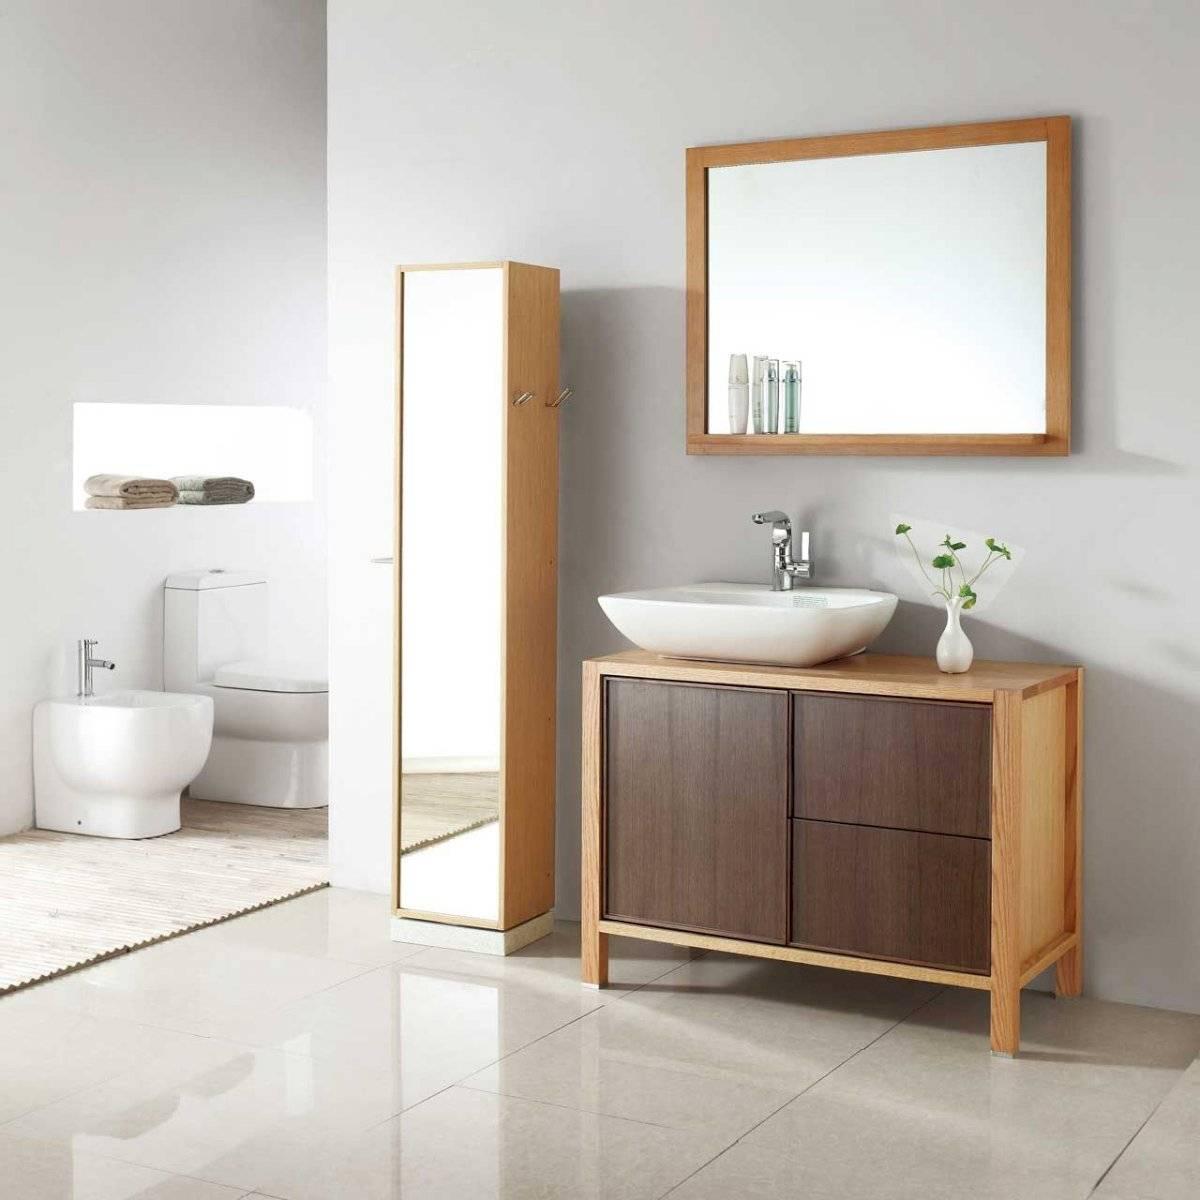 Detalles de madera en el baño